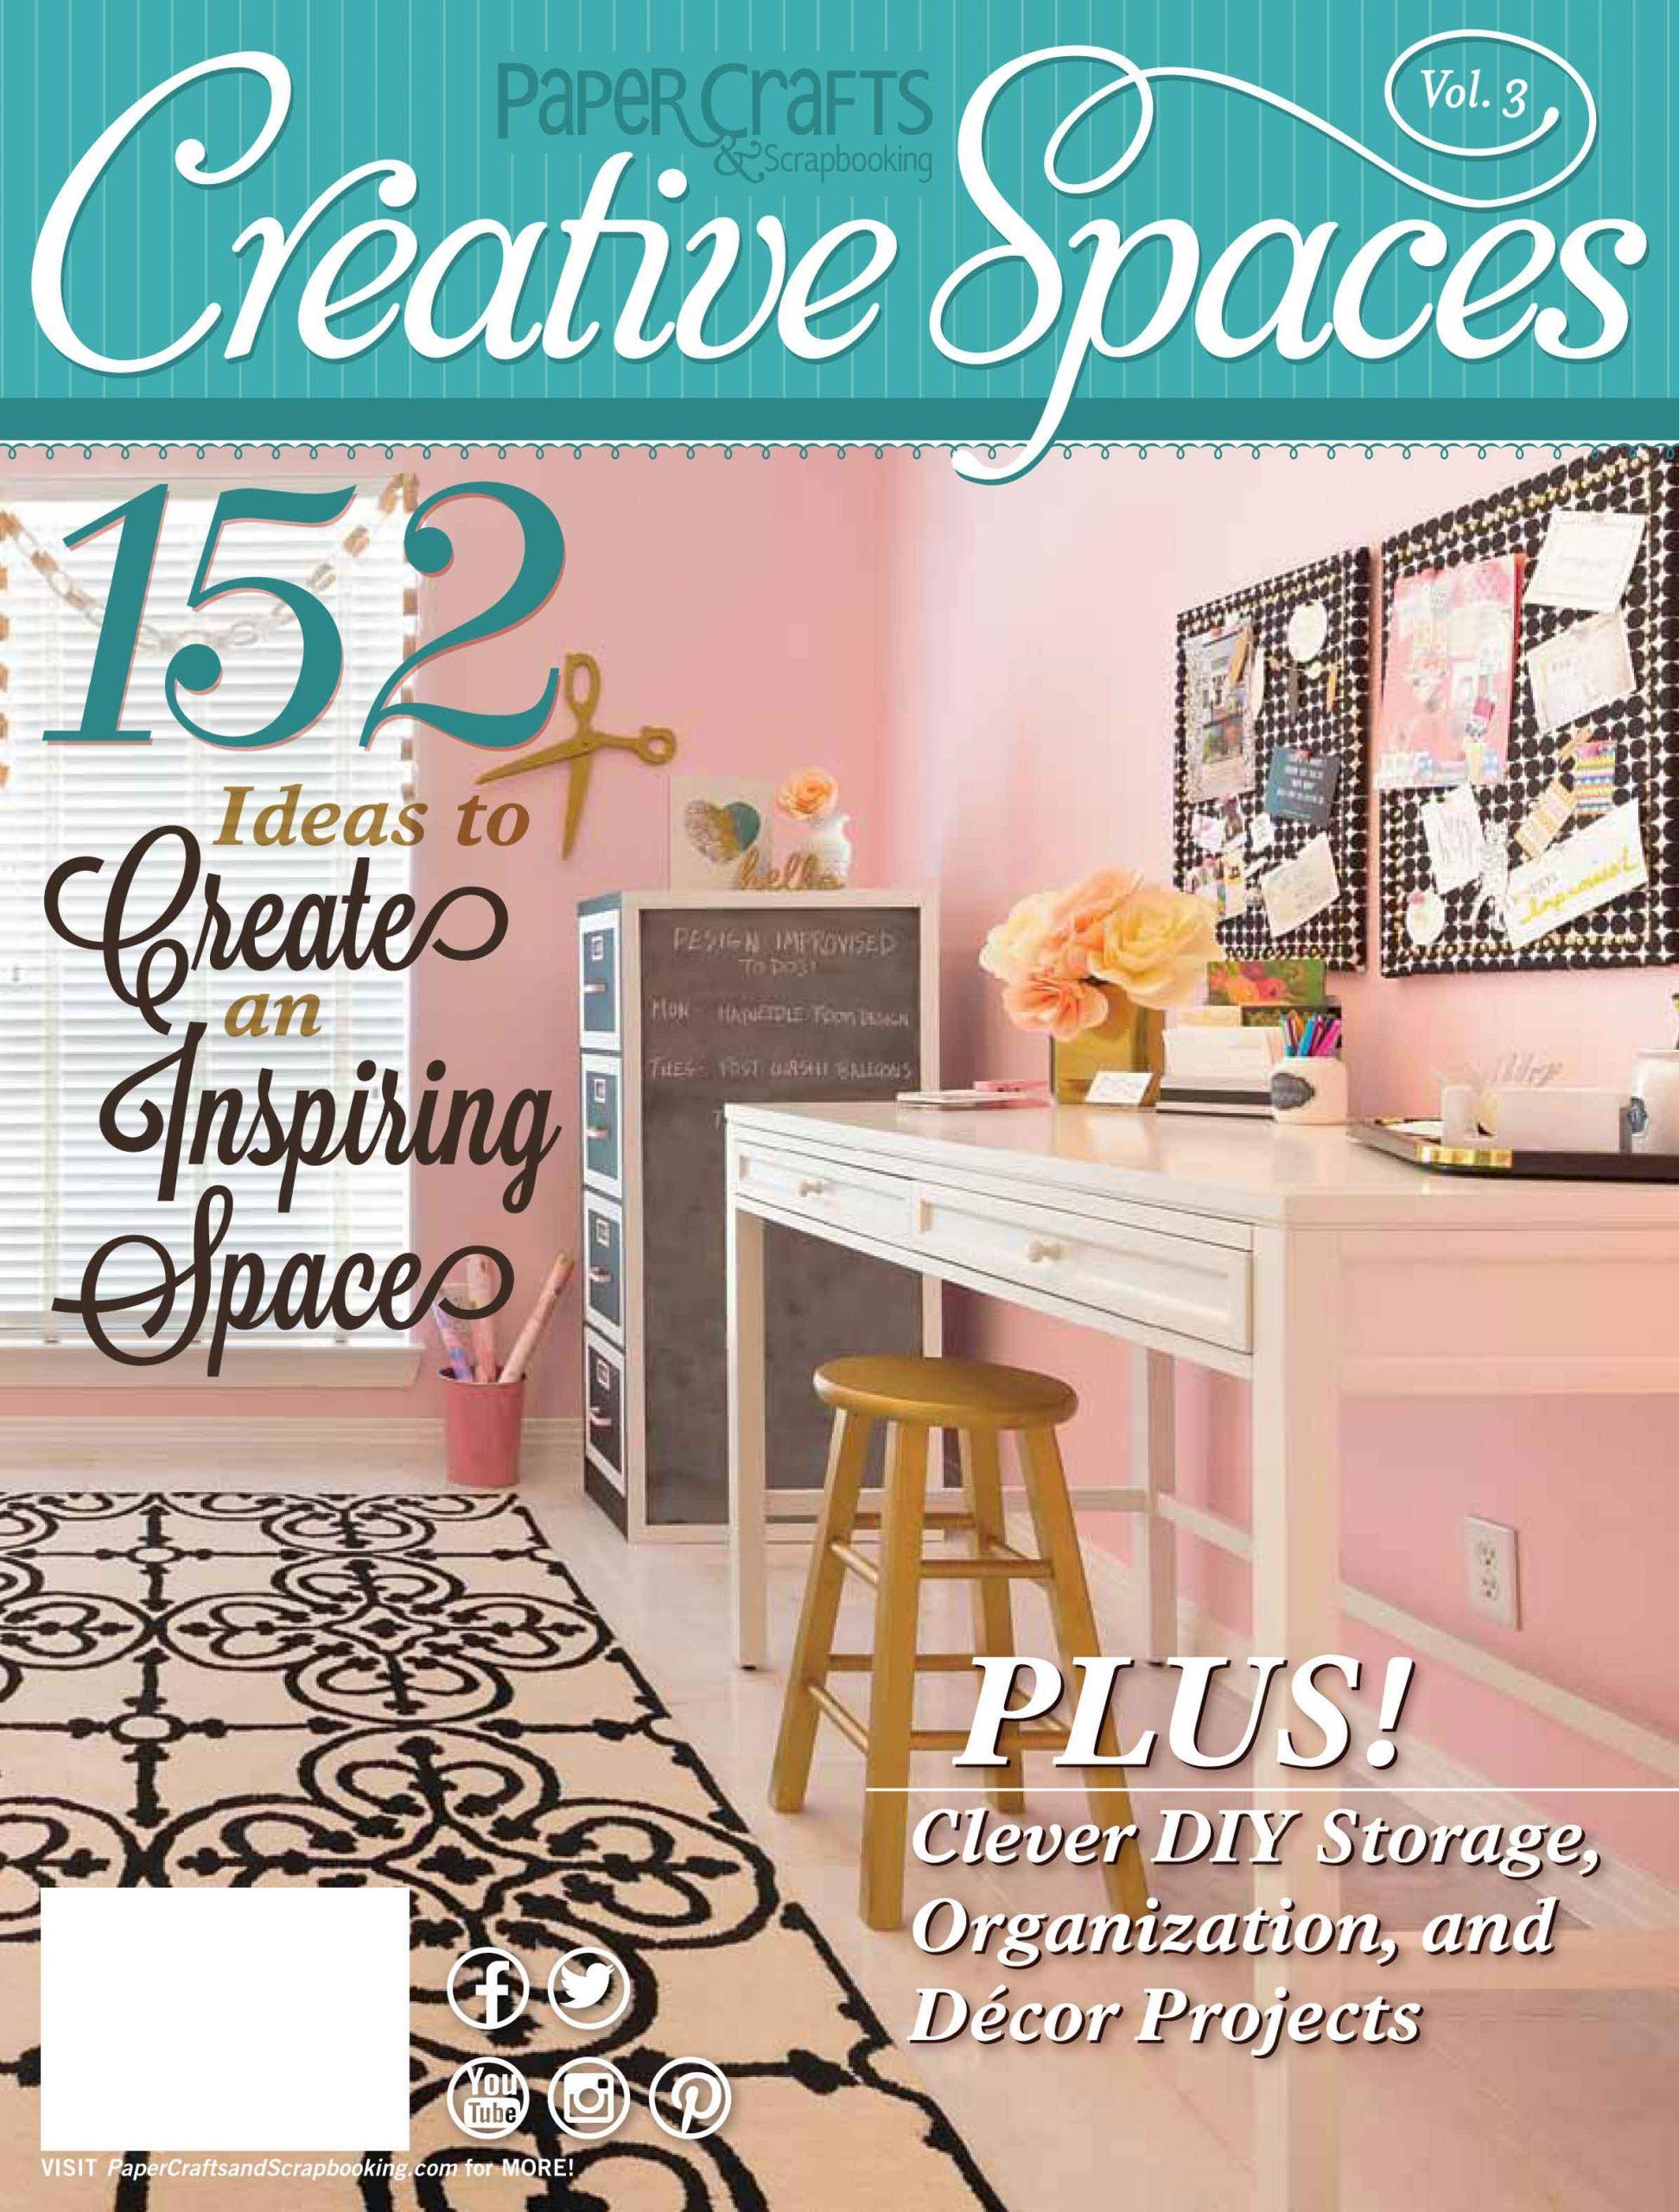 Inspiring Creative Spaces! [Blog Hop!] #creativespacesvol3